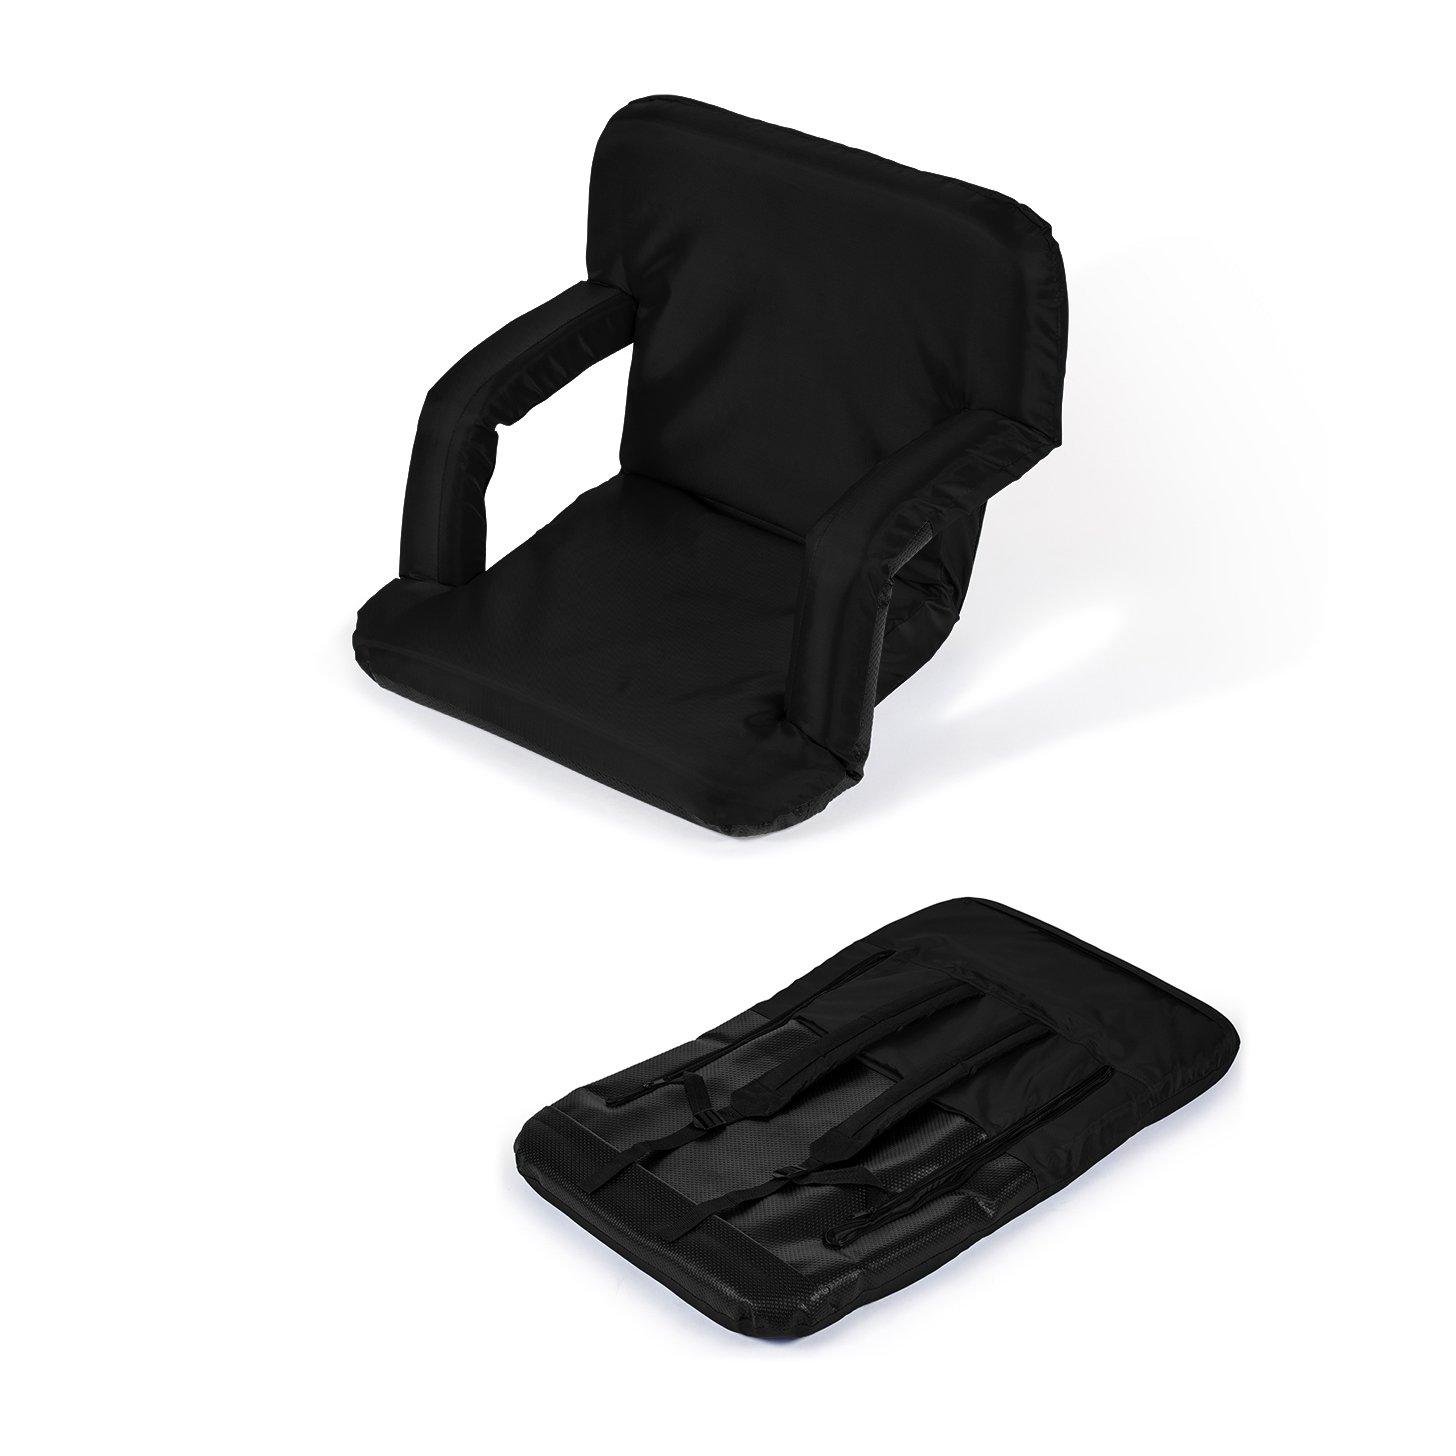 Portable Multiuse Adjustable Recliner Stadium Seat by Trademark Innovations (Black)